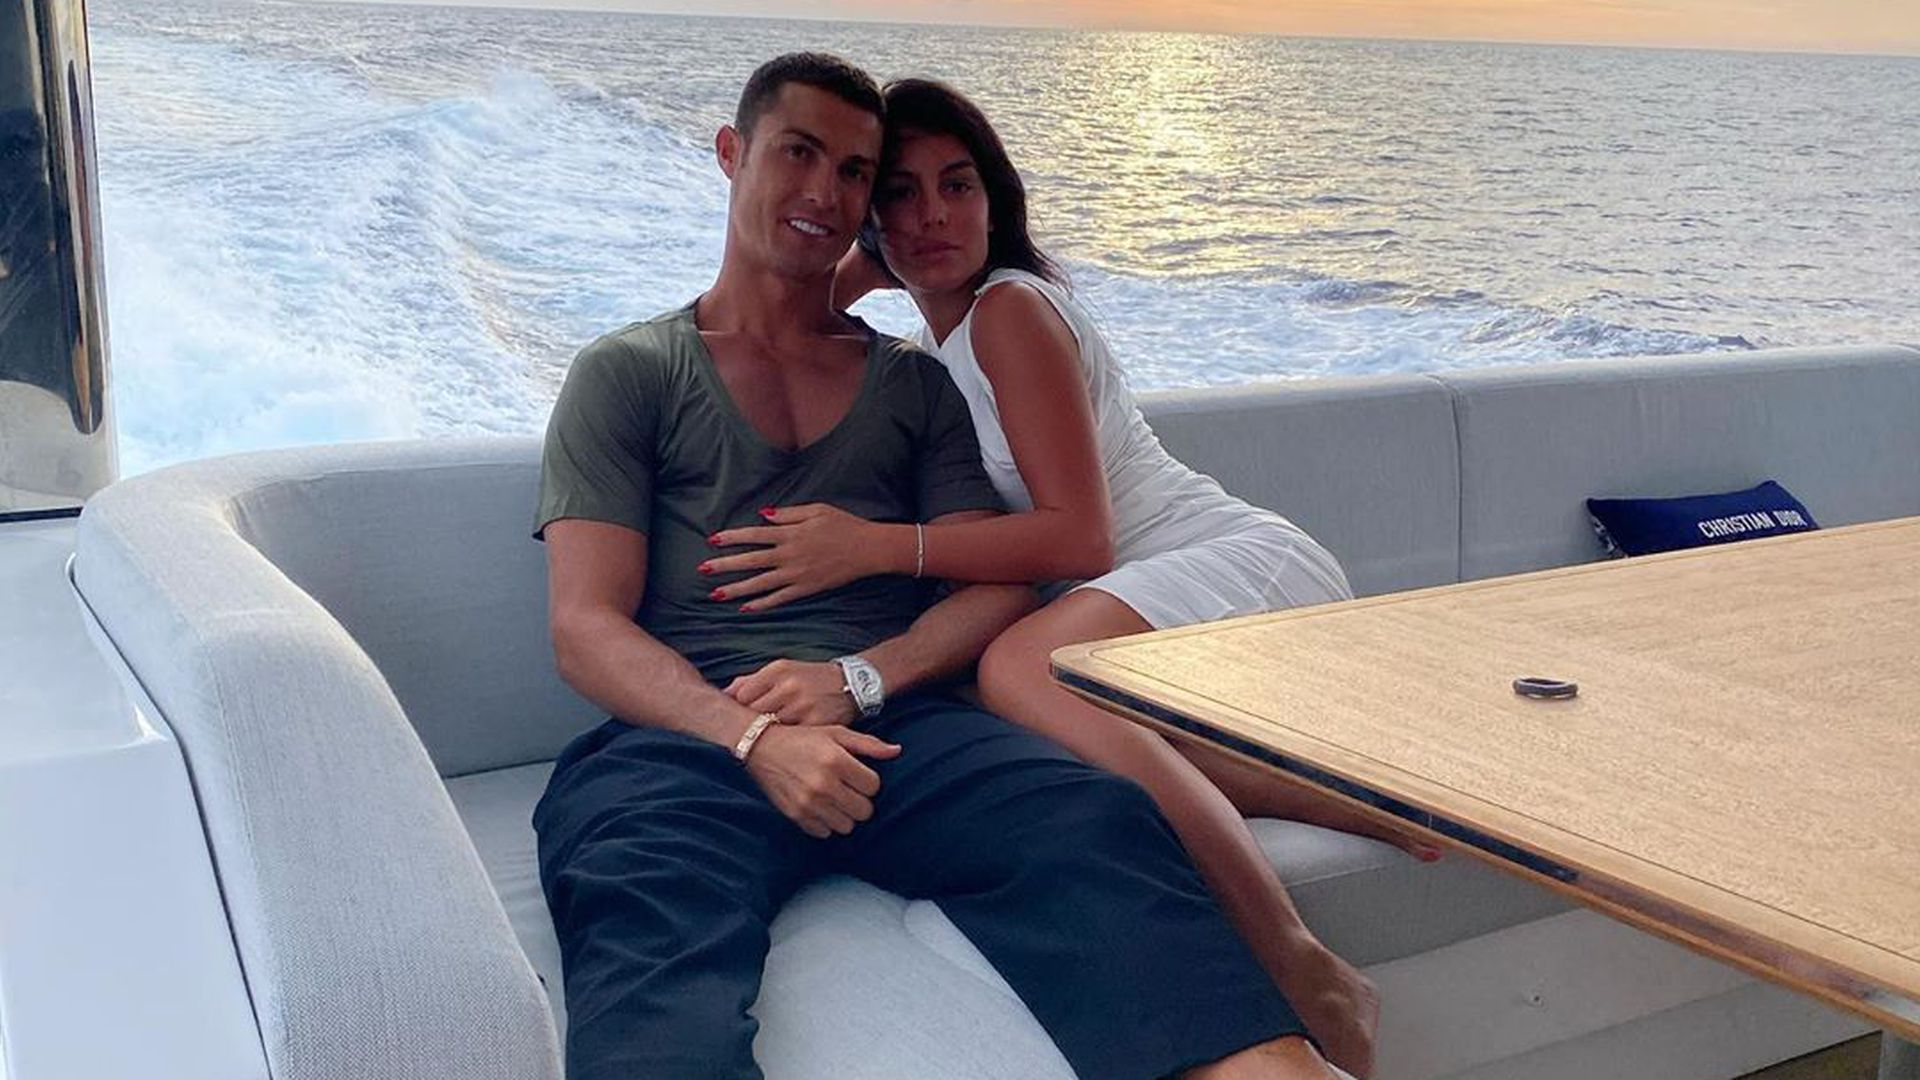 Ist Cristiano Ronaldo Verheiratet